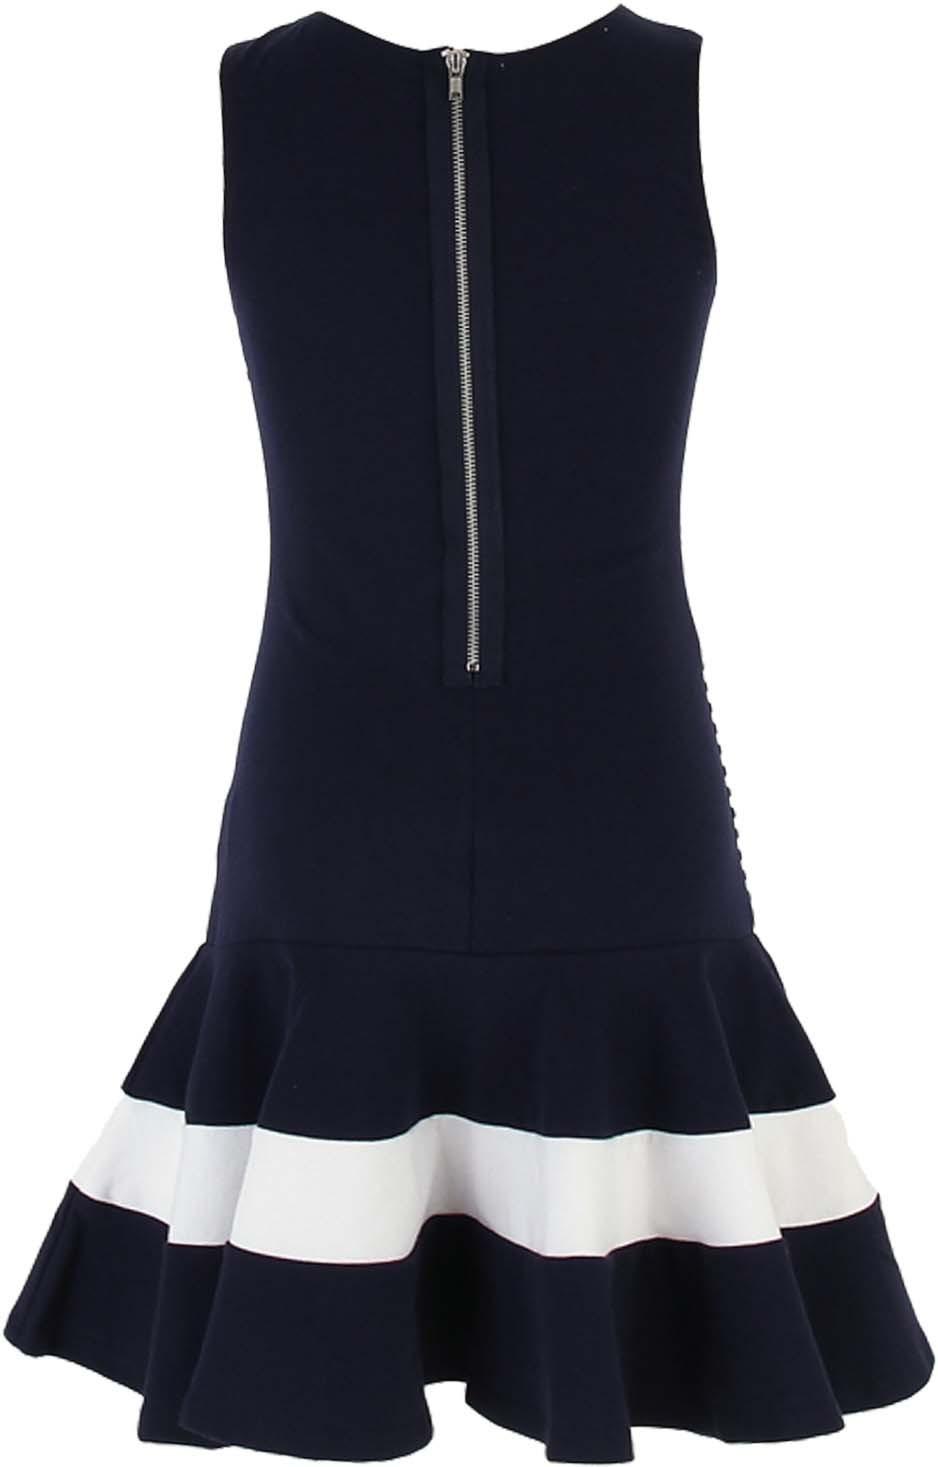 Kate Mack - Biscotti Big Girl Tween 7-16 Navy-Blue White Stripe Drop Waist Dress